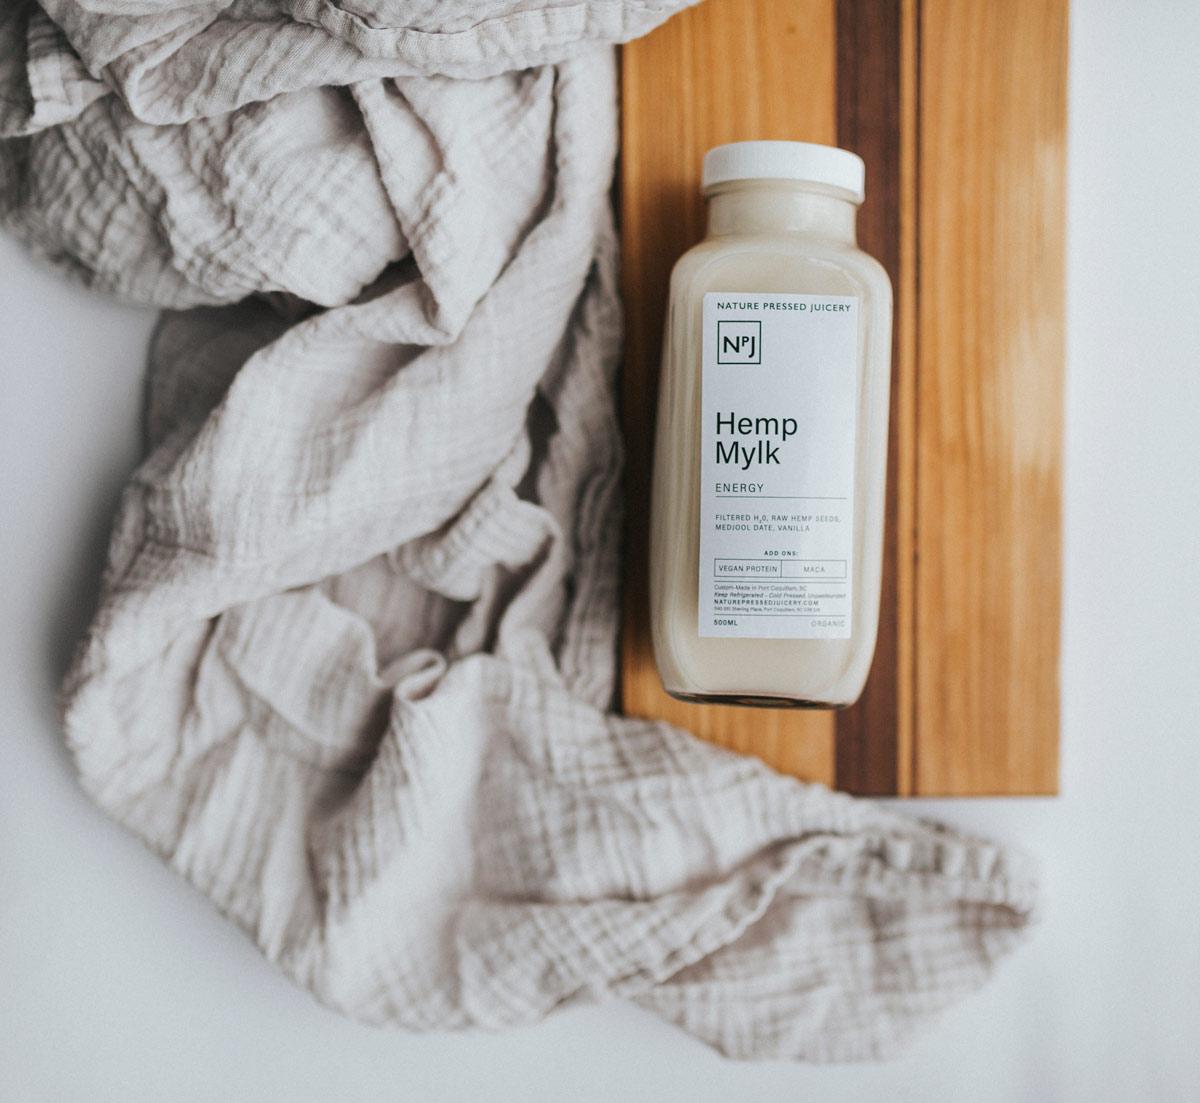 Almond Mylk by Nature Pressed Juicery